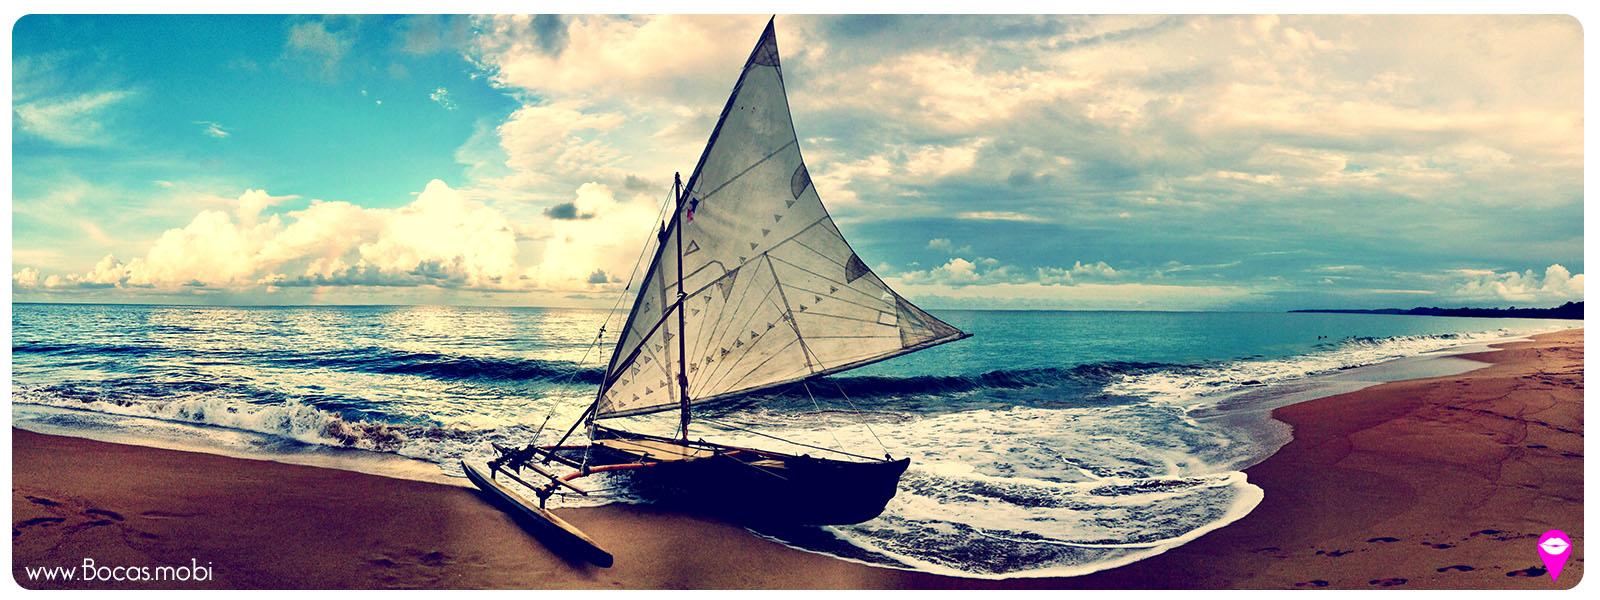 Bocas del Toro App - Panama - Bocas Mobi